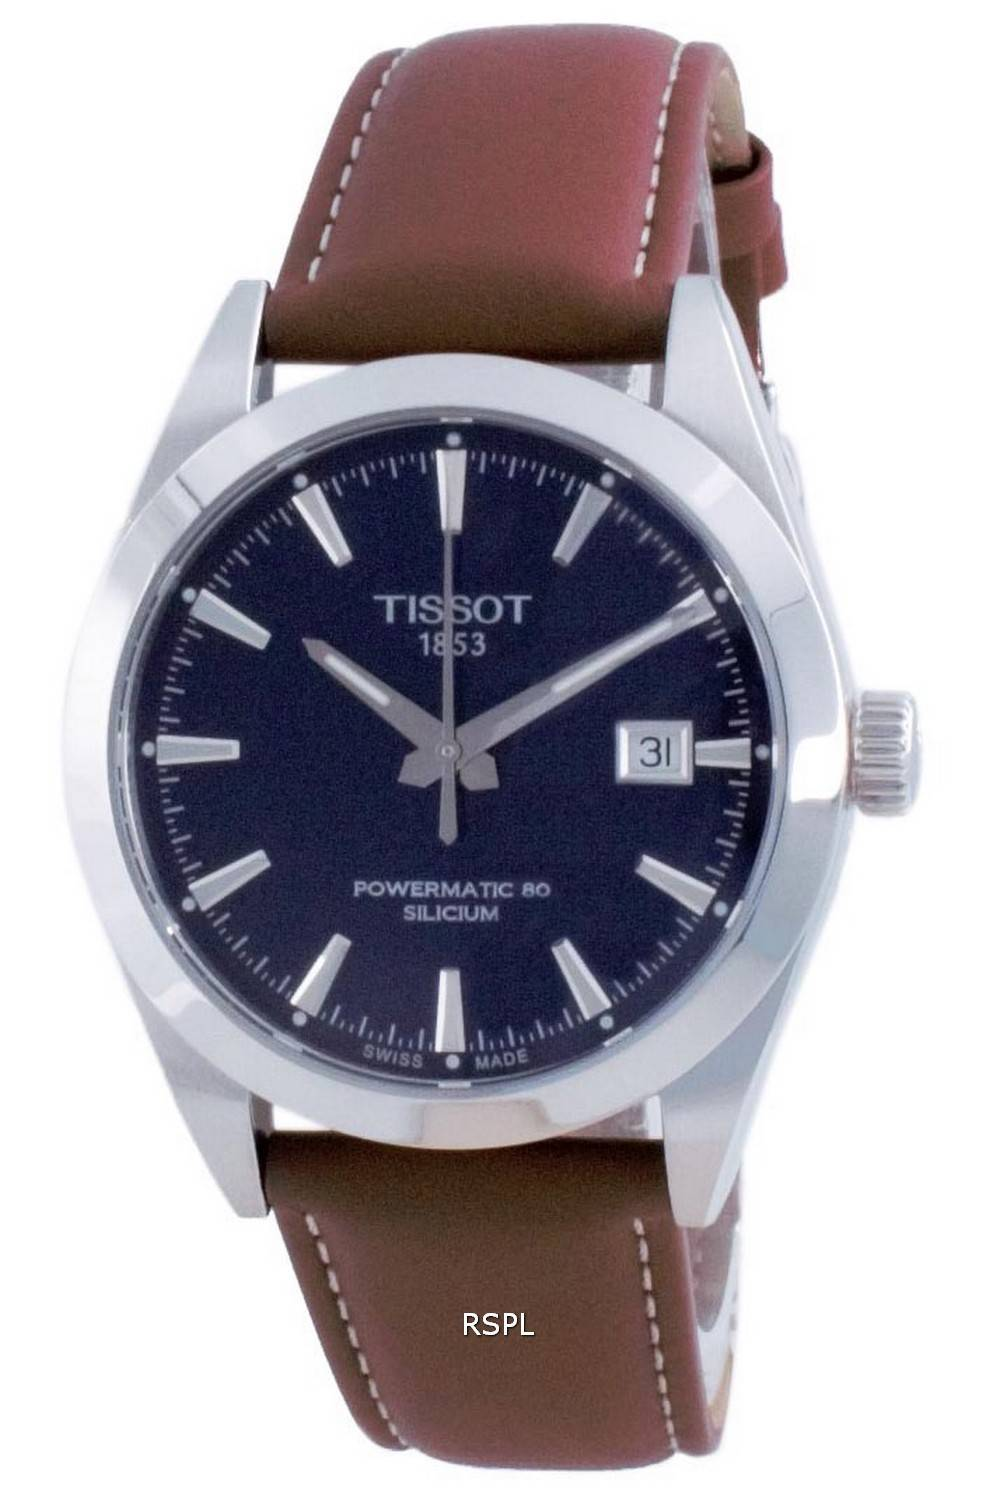 Tissot T-Classic Gentleman Powermatic 80 Silicium Automatic T127.407.16.041.00 T1274071604100 100M miesten kello